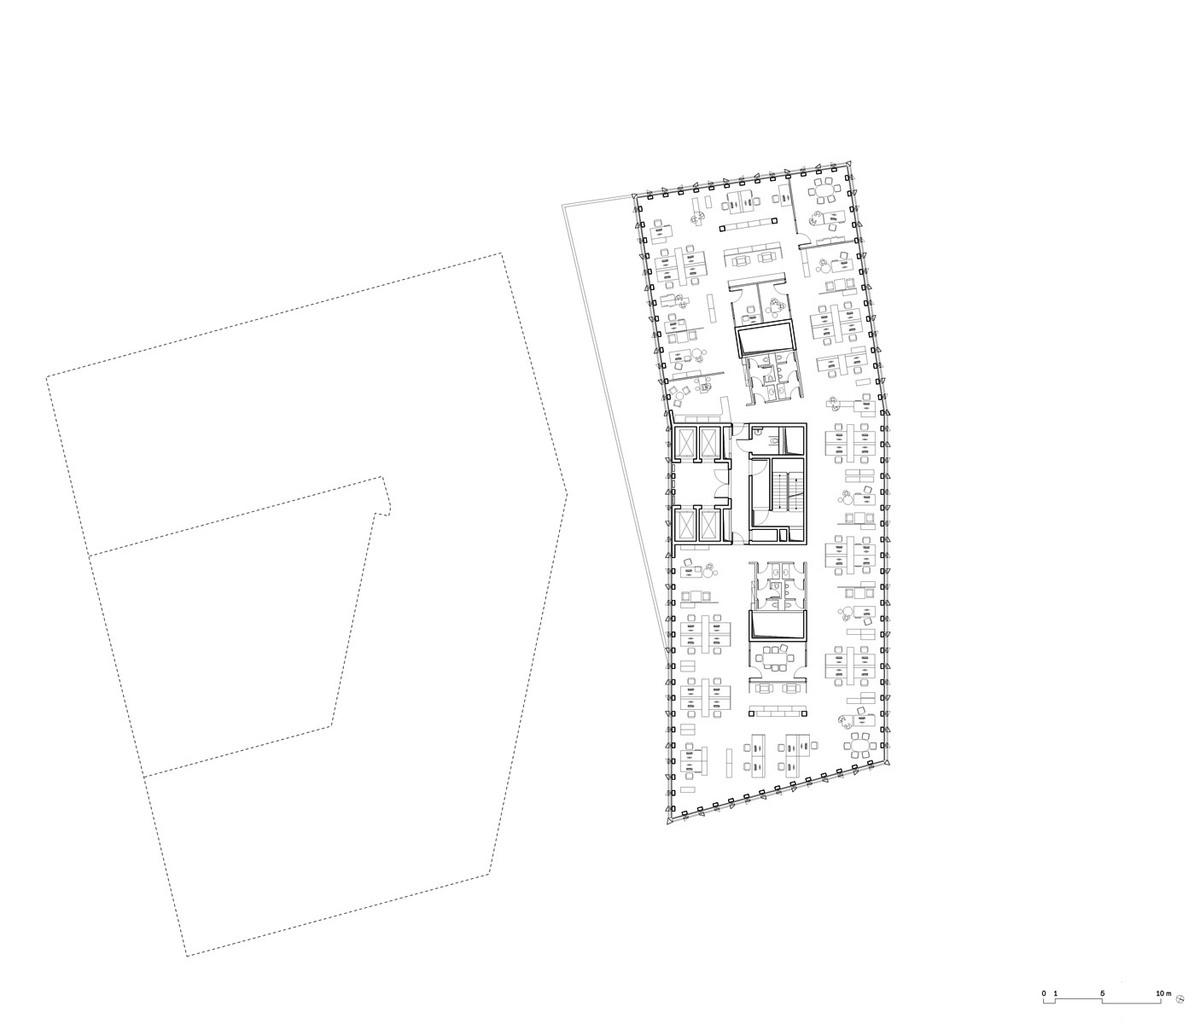 Floor plan +10 (Image: Barkow Leibinger)